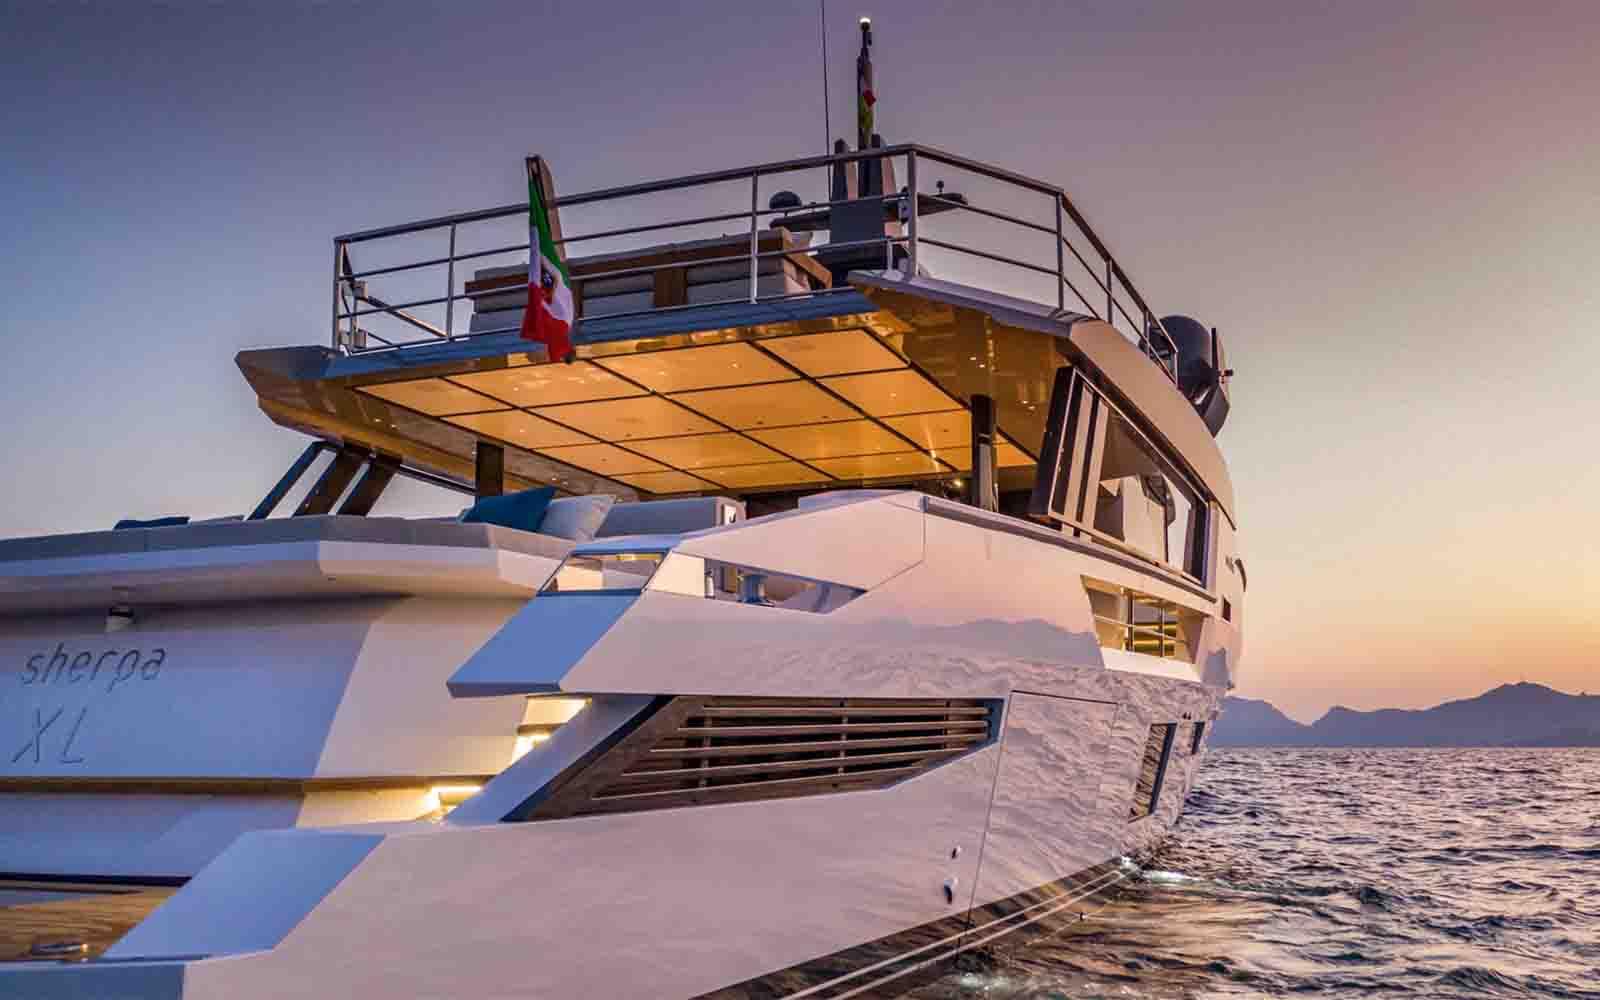 Arcadia Sherpa XL - boat shopping